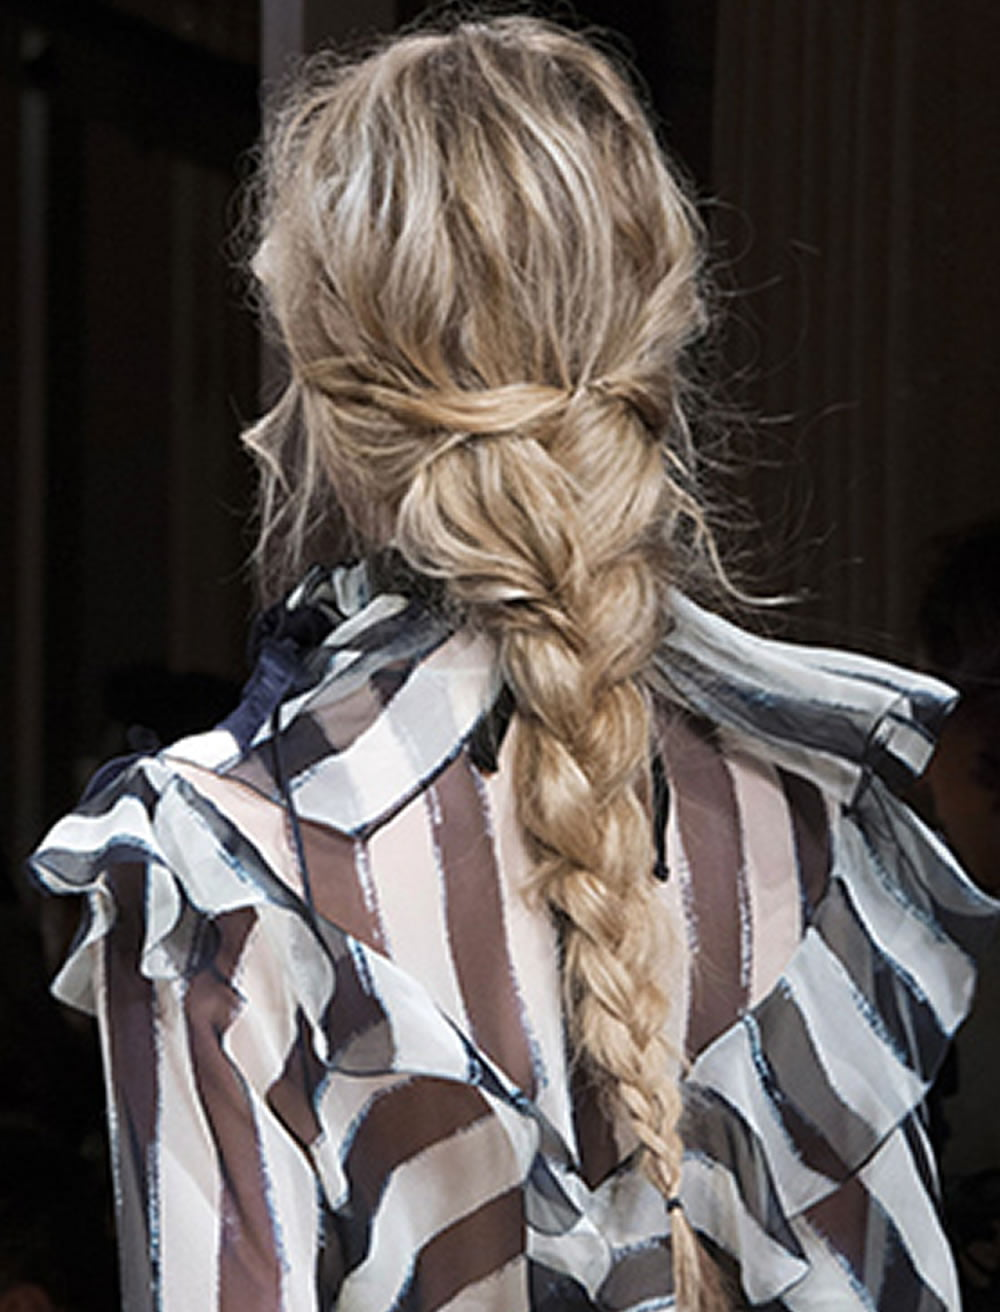 foto 20 Beautiful Fishtail Braided Hairstyles